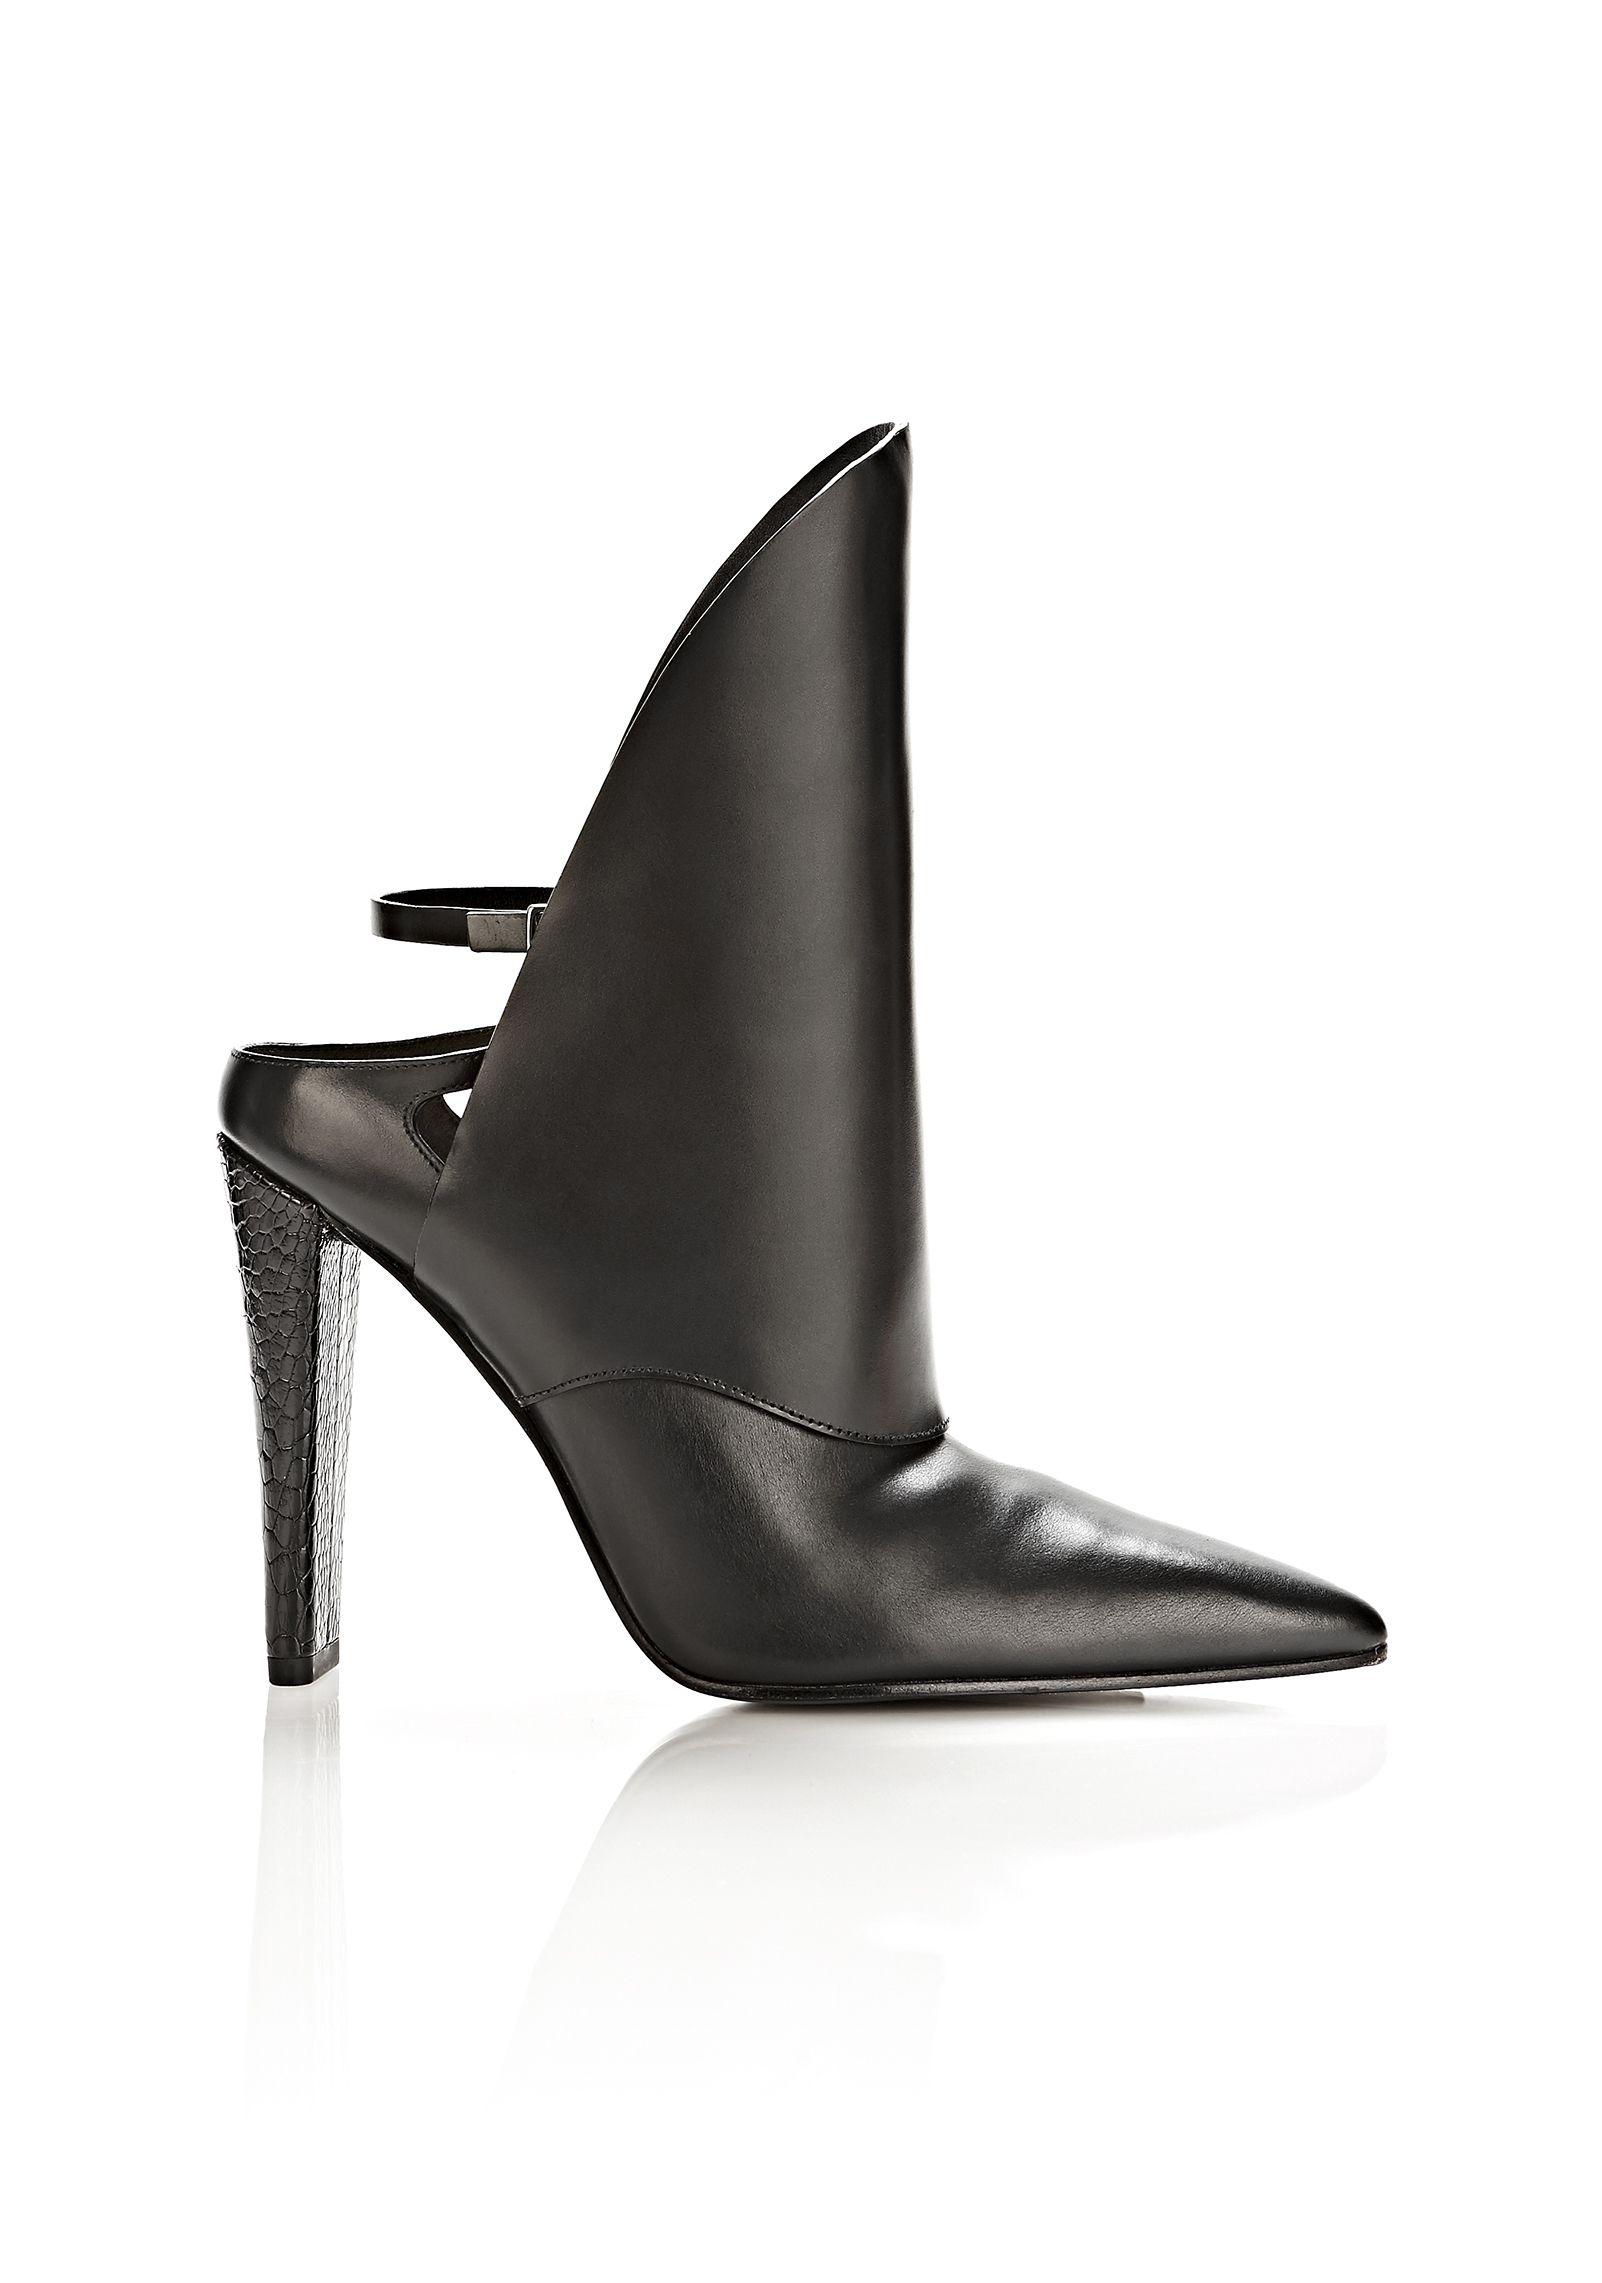 Heels Women - Shoes Women on Alexander Wang Online Store